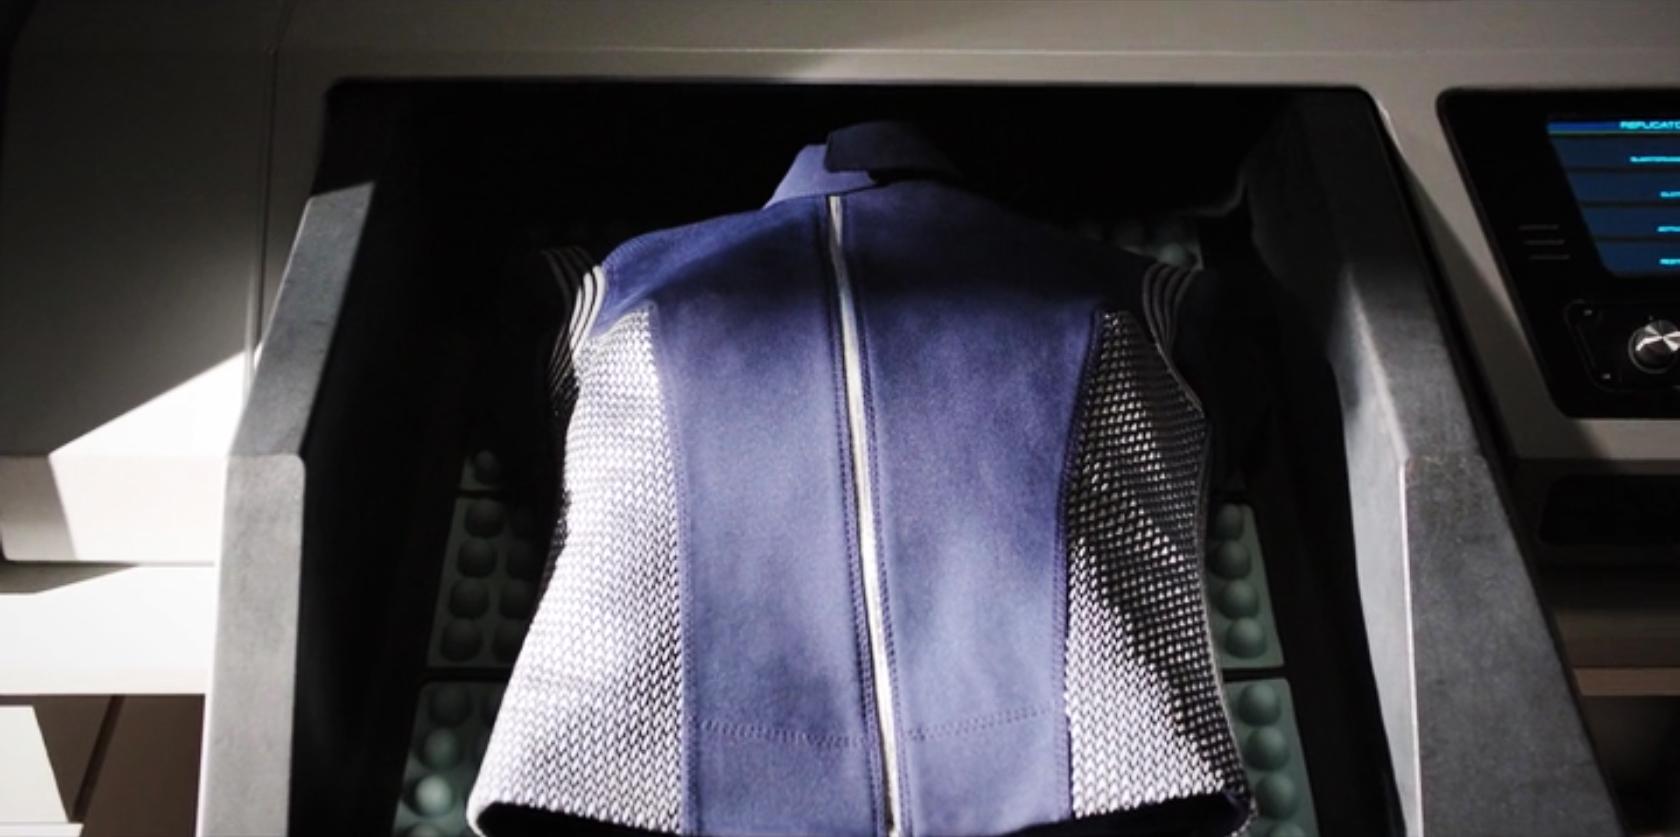 Michael Burnham's synthesized uniform (episode 4)